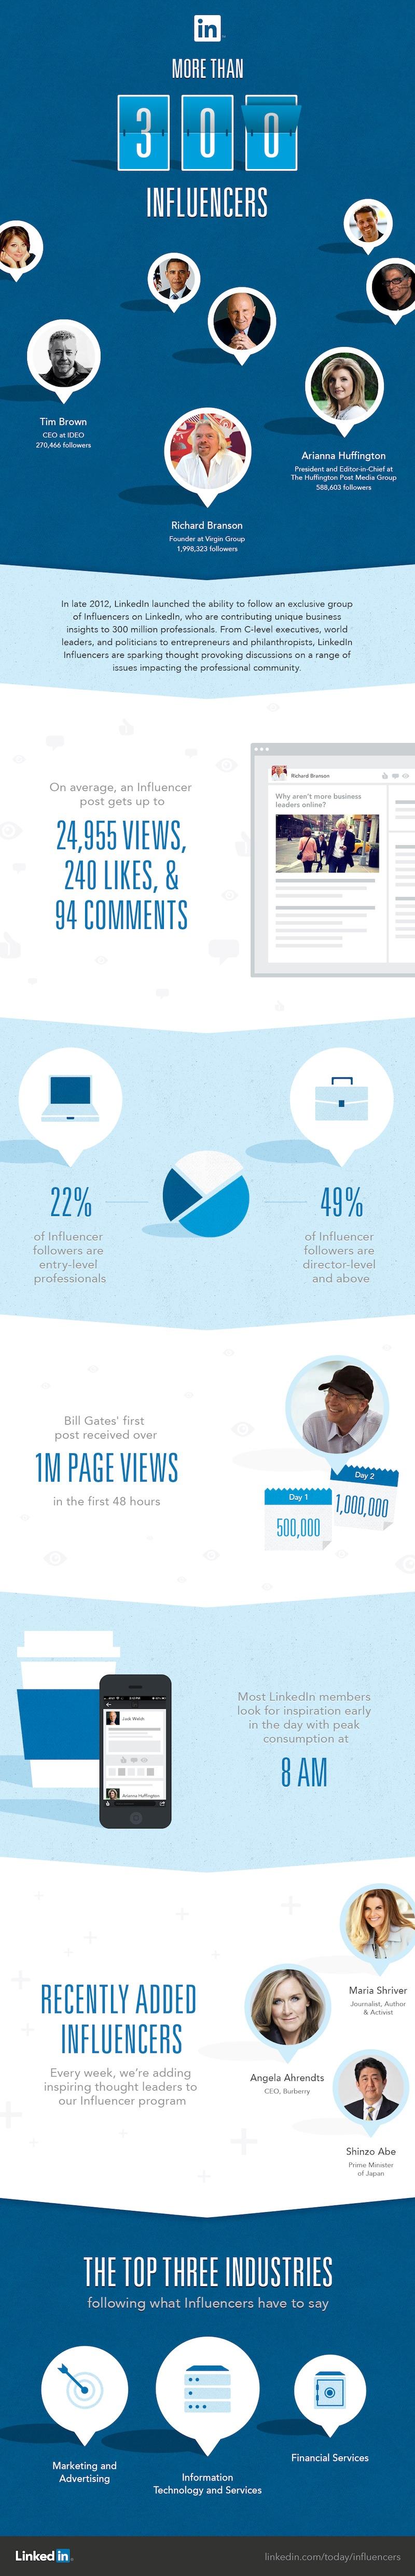 LinkedIn Influencers Infographic